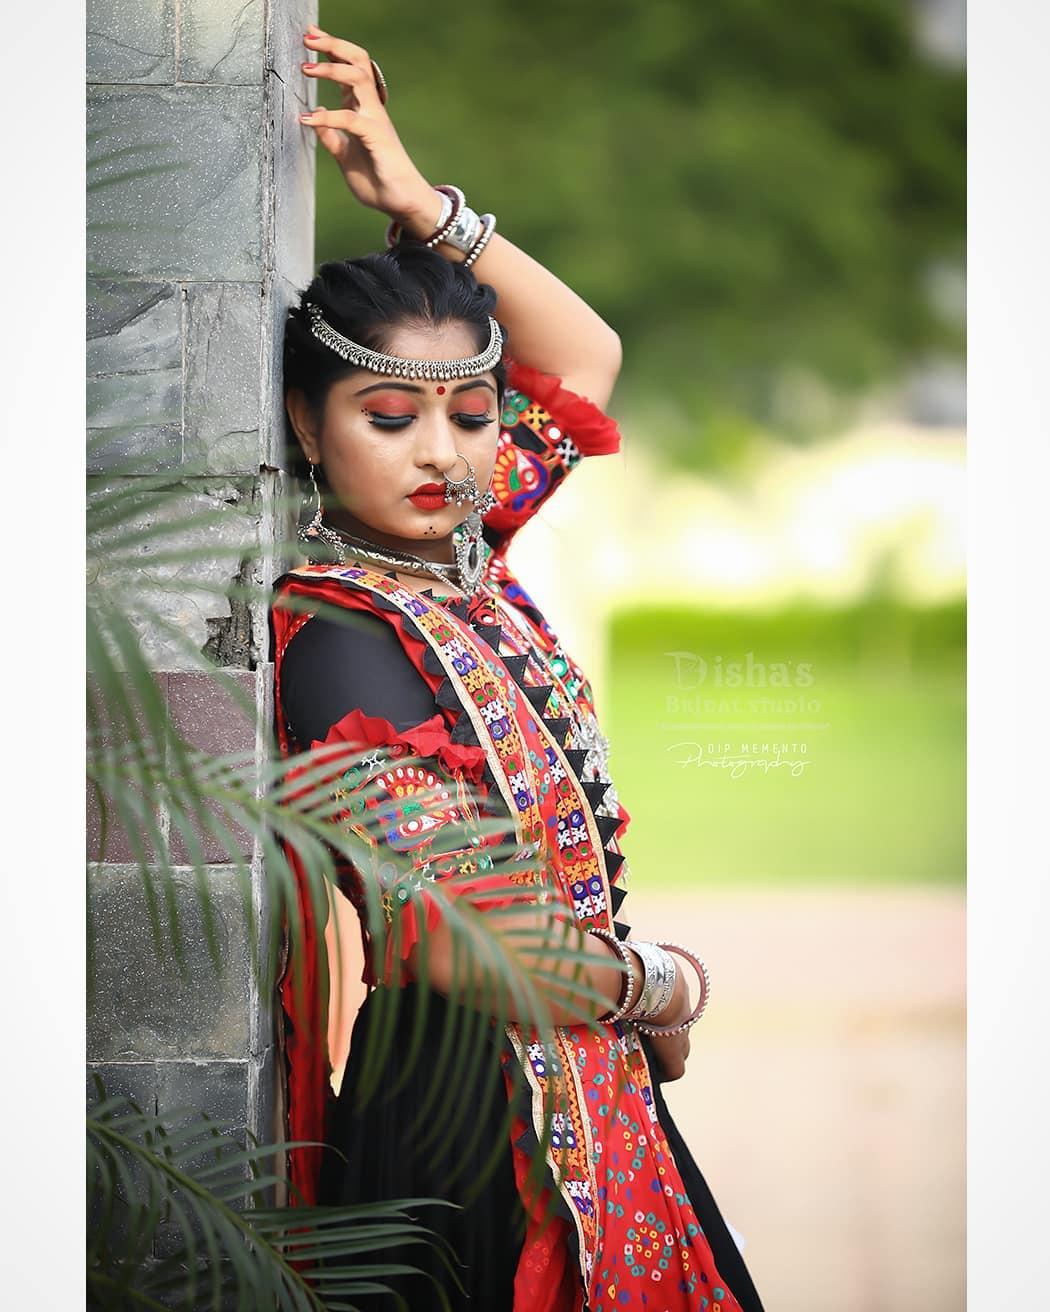 Just trying something different to break stereotype. . . MUA: @dishapanchal246  Shoot: @dip_memento_photography @meandmyphotography11  InFrame: @shrutigoswami51  Costume by: @rashmithummar  #navratri2019 #photoshoot #ethnic #traditionalart #ahmedabad #gujarati  #pop #makeup #navratrichaniyacholi #chaniyacholi #indianfashionblogger  #fashionblogger #makeuptutorial #weddingdress #sexy#instagram #instapic #bollywood #bollywoodhotness #bollywoodactresses #indian #pic #picoftheday #photooftheday ##instagood#instamood #festivalofnations #festival